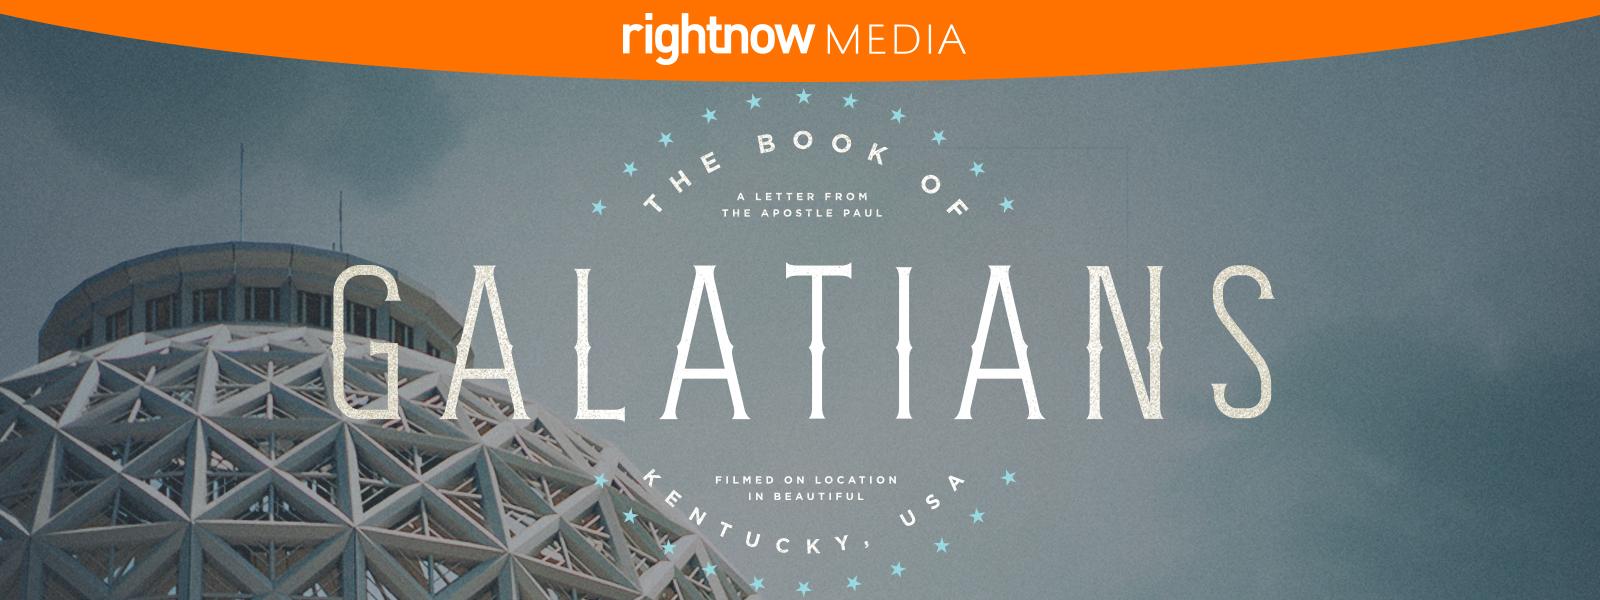 Galatians Title Image.jpg